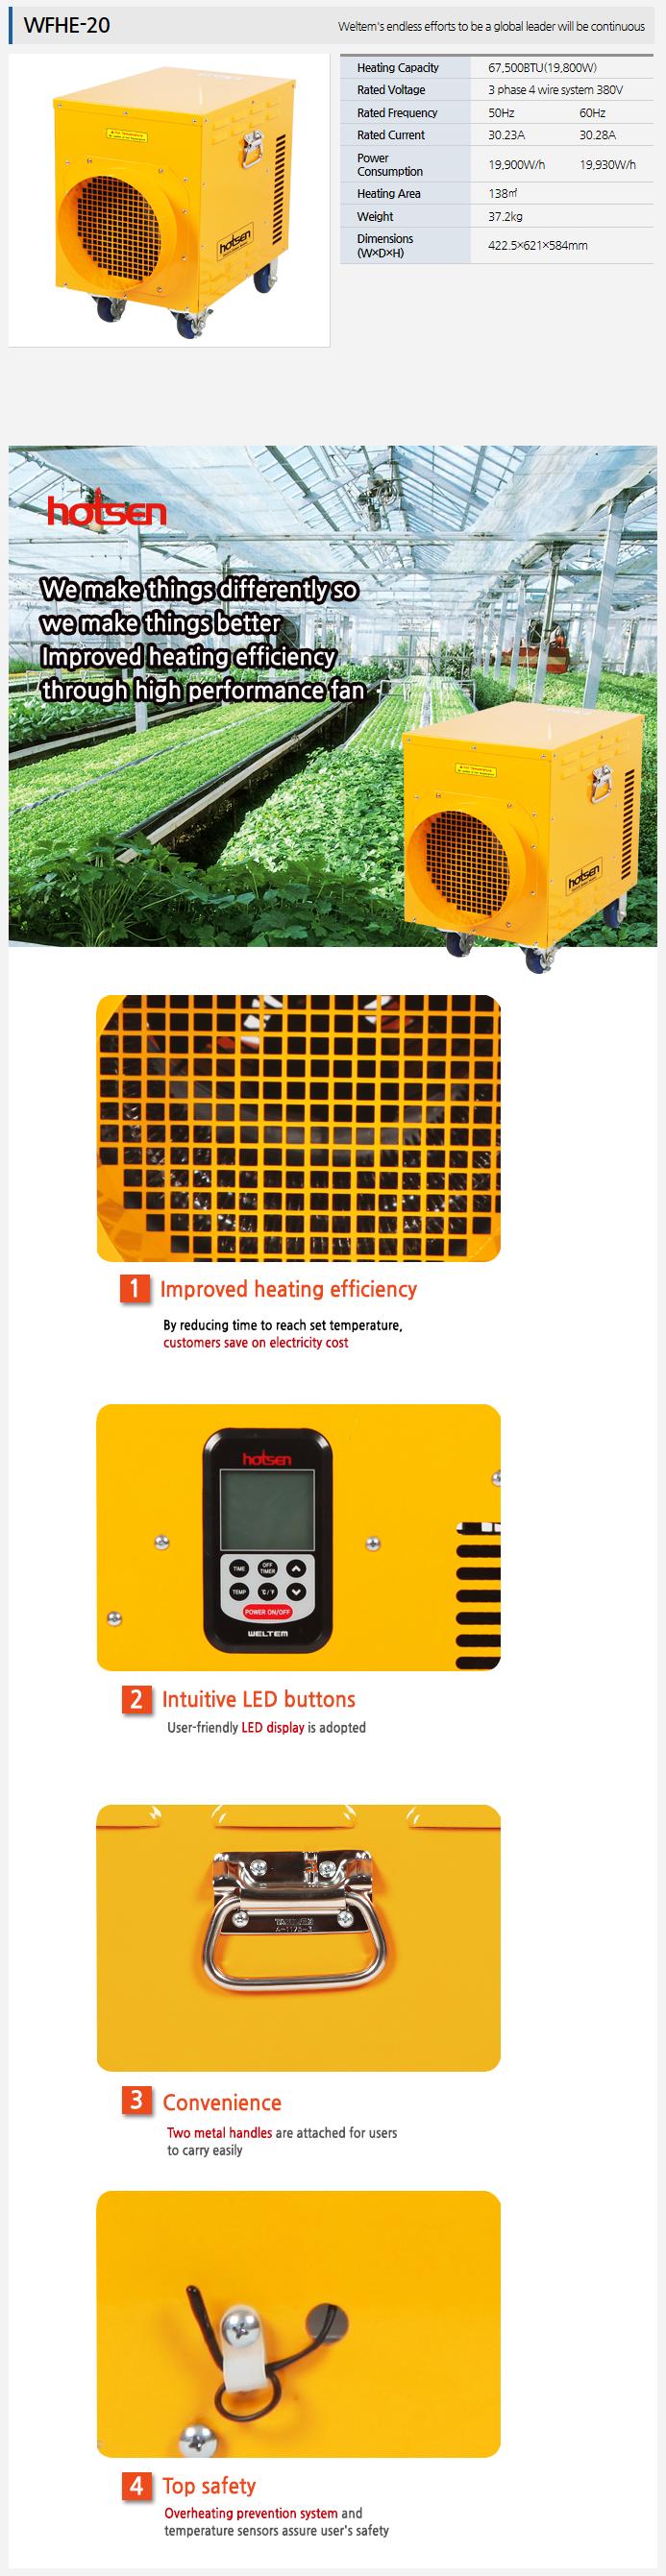 WELTEM Electric Blower Heater (380V) WFHE-20